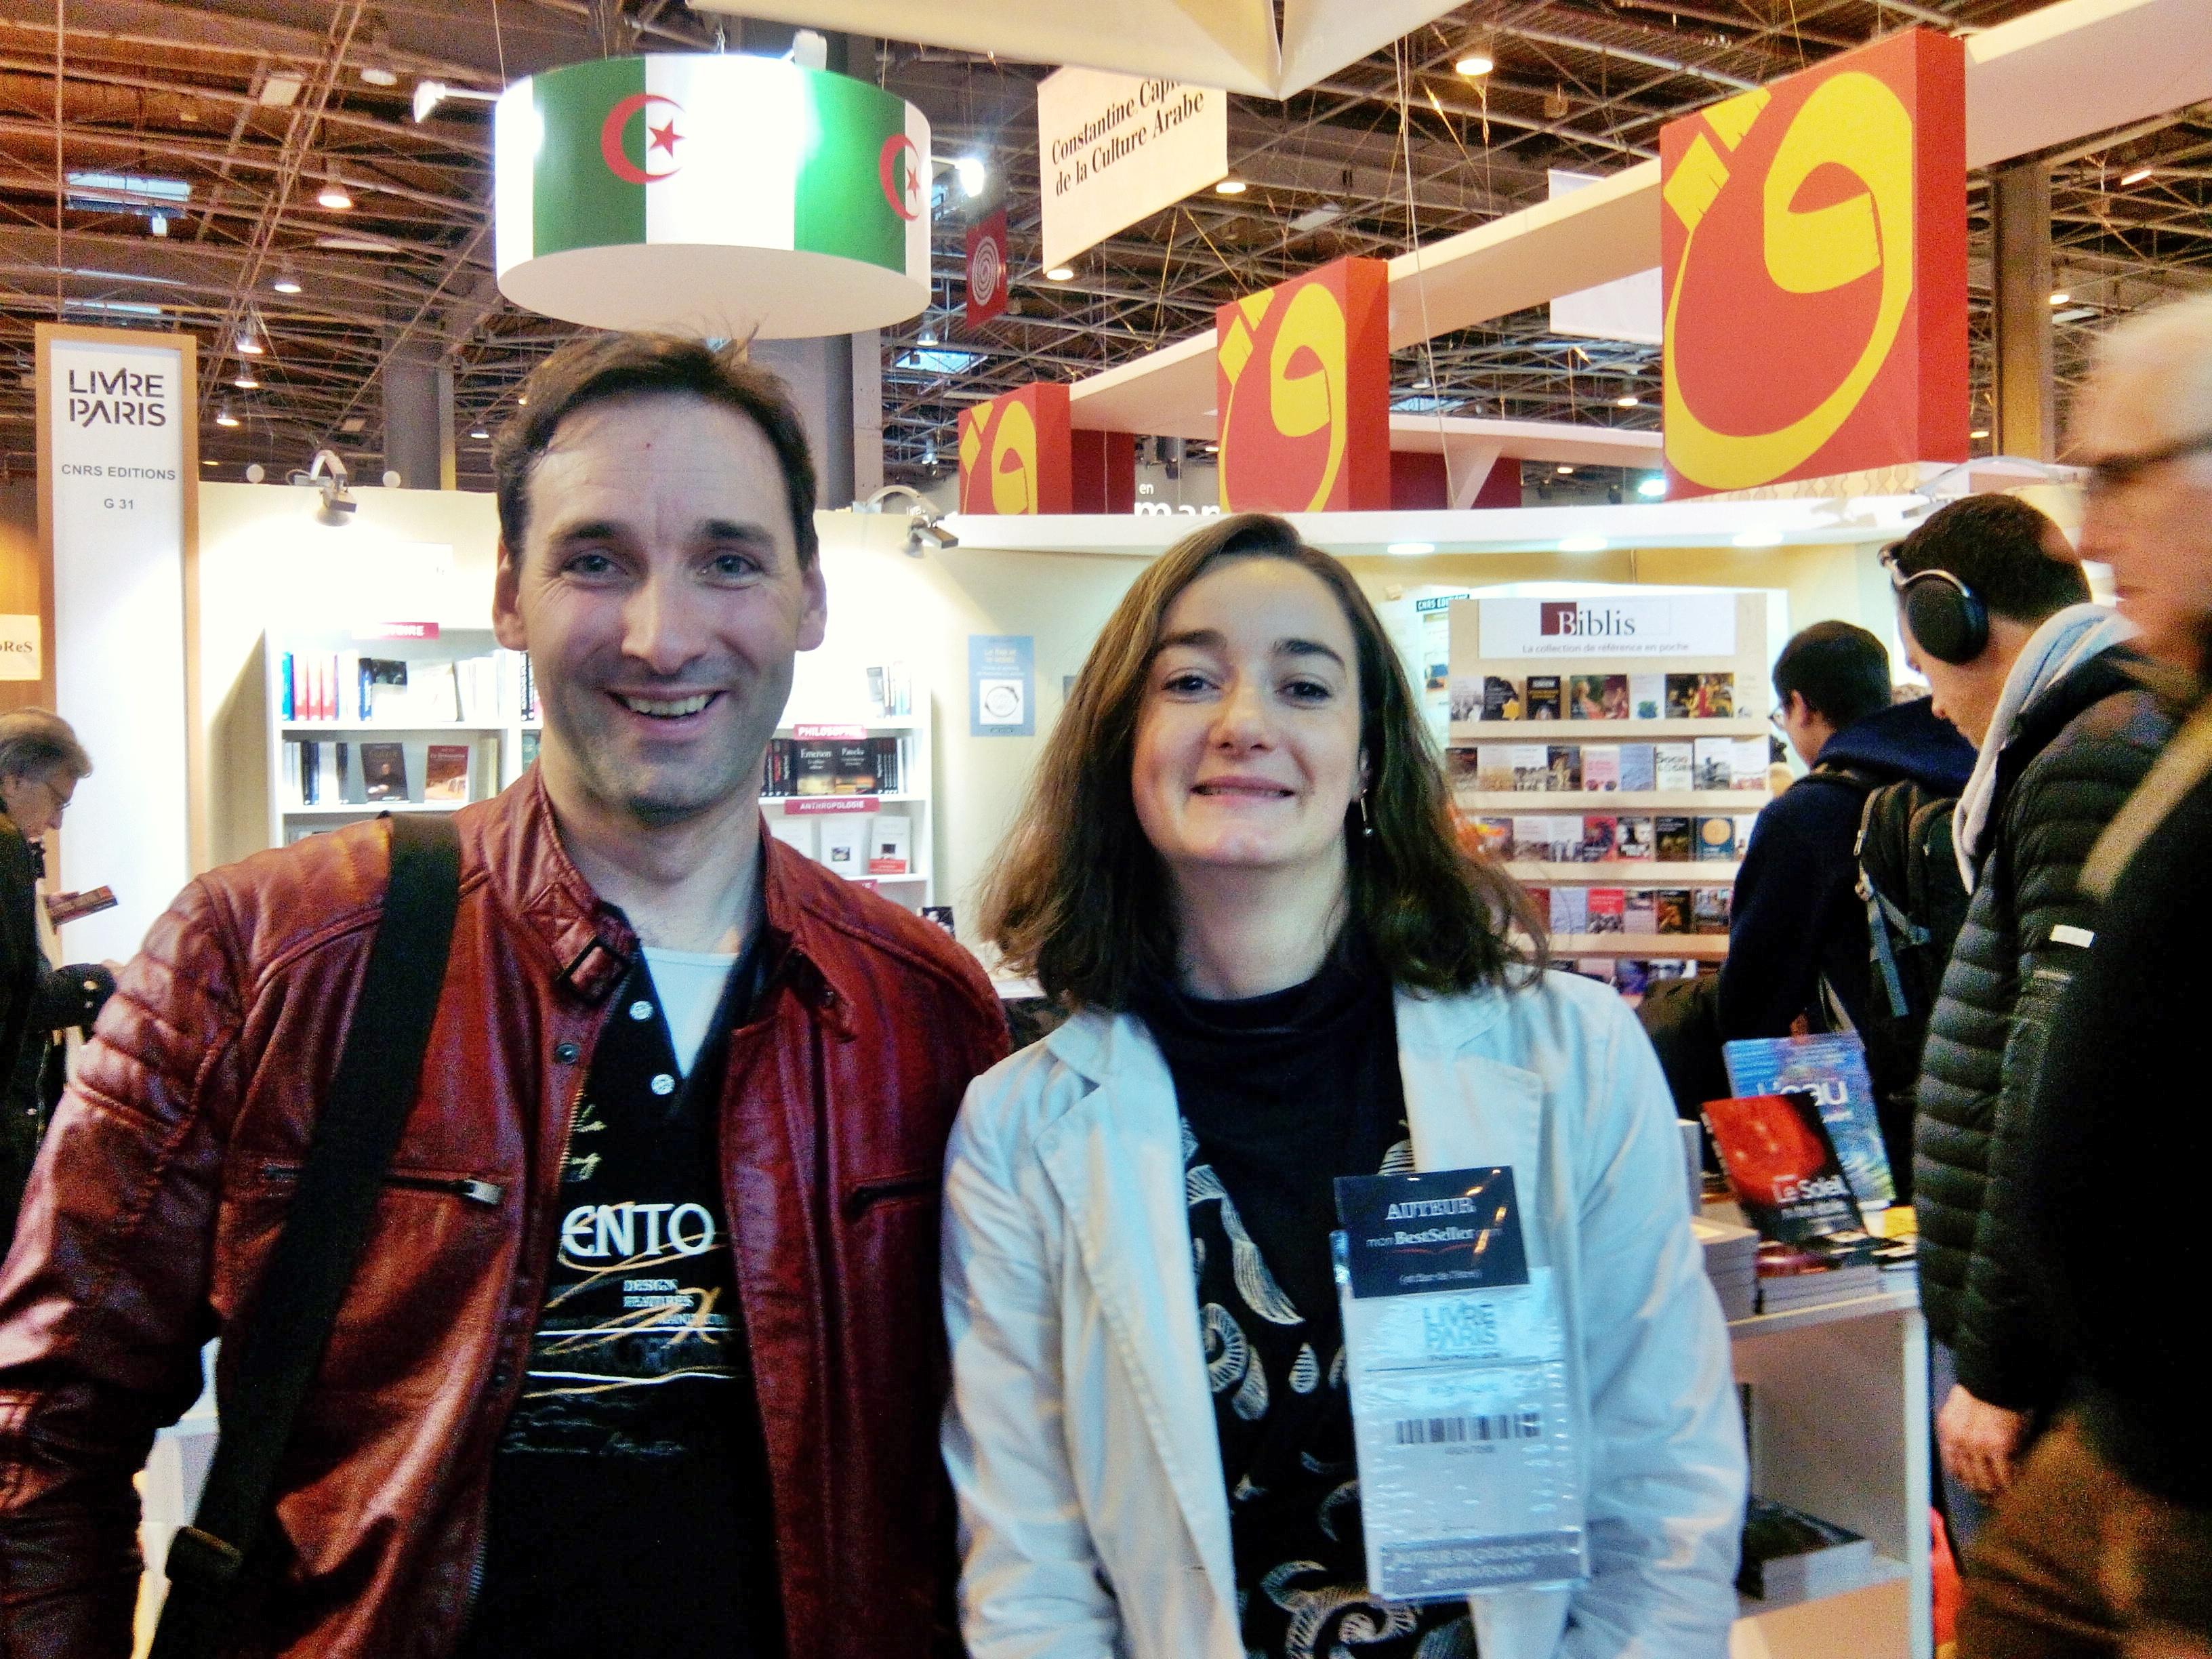 Marie Havard et Charles Edouard mandefield Livre Paris 2016